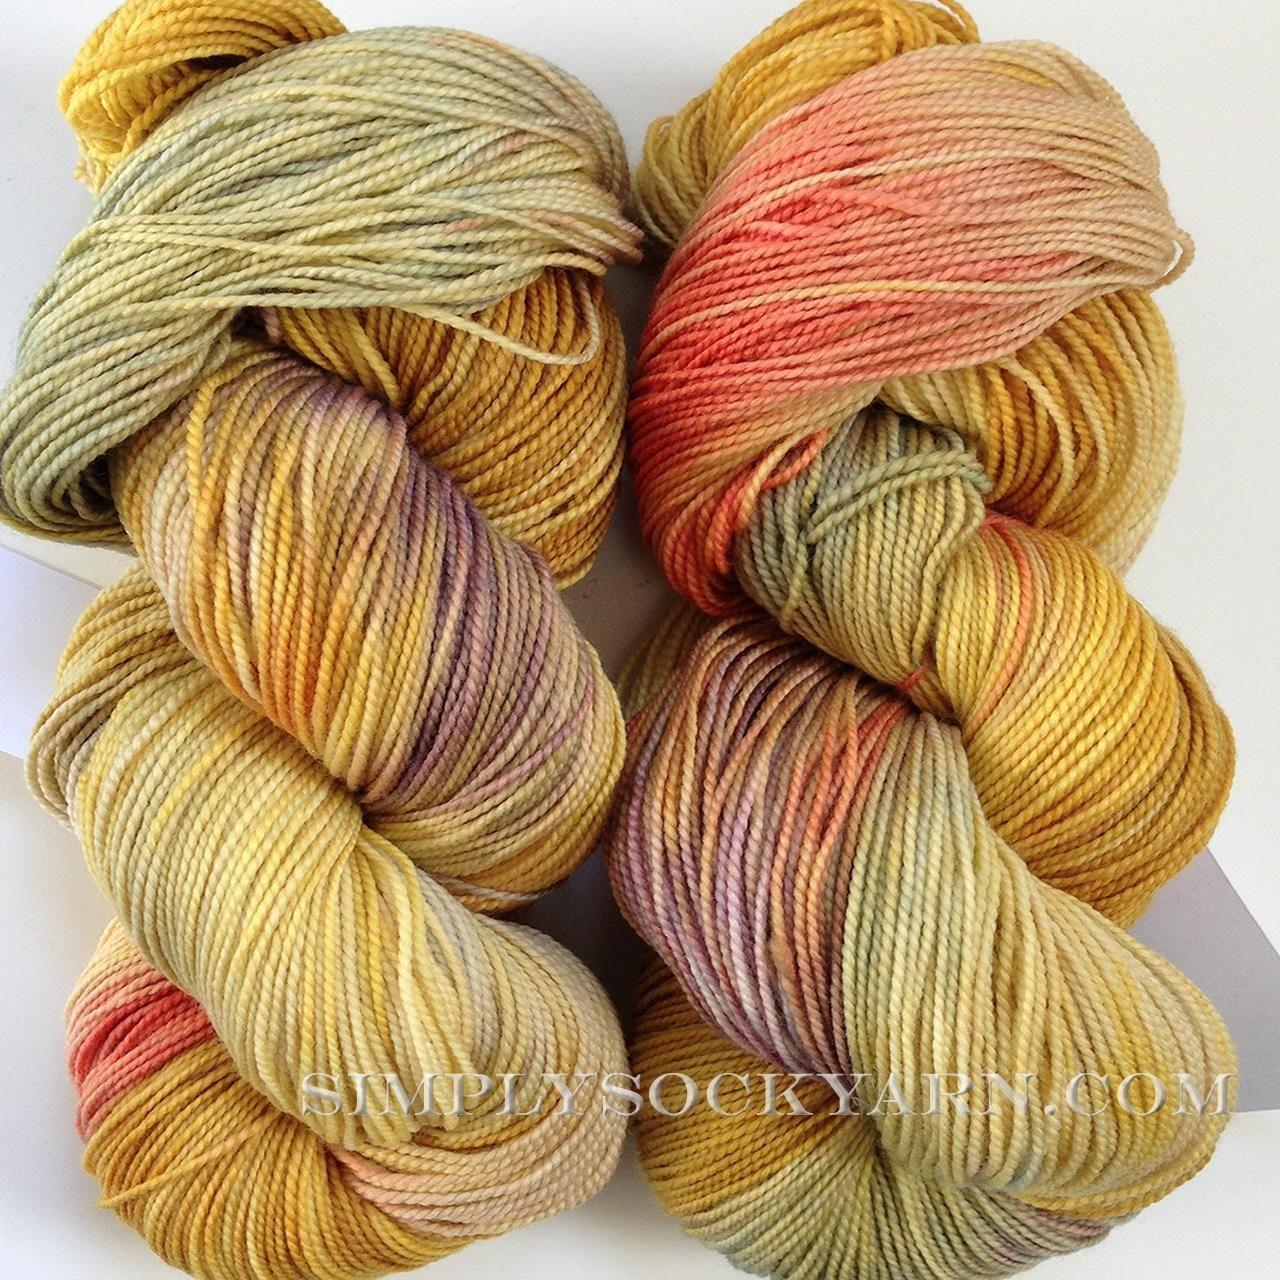 Simply Socks Yarn Company - FS Fave Sun Dress, $26.00 (http://www.simplysockyarn.com/fs-fave-sun-dress/)